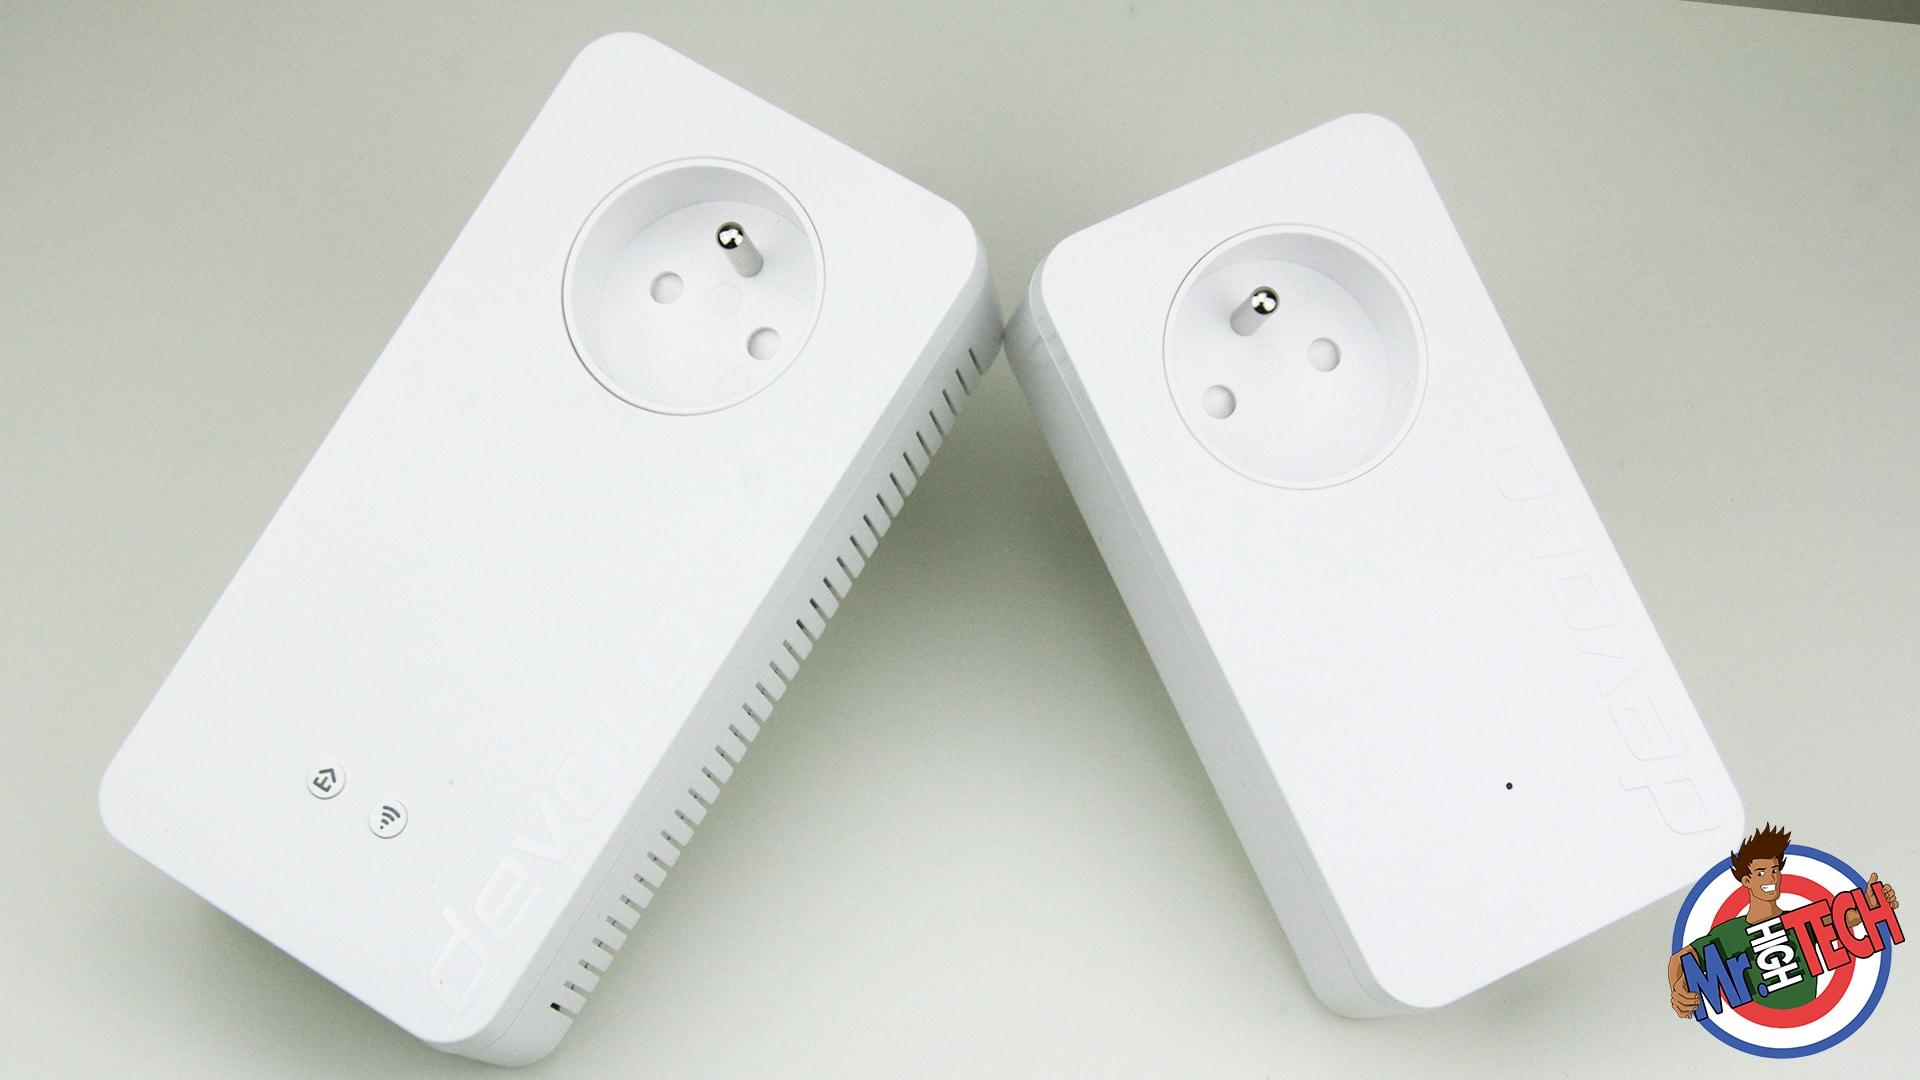 test devolo dlan 1200 wifi ac starter kit cpl devolo mrhightech. Black Bedroom Furniture Sets. Home Design Ideas